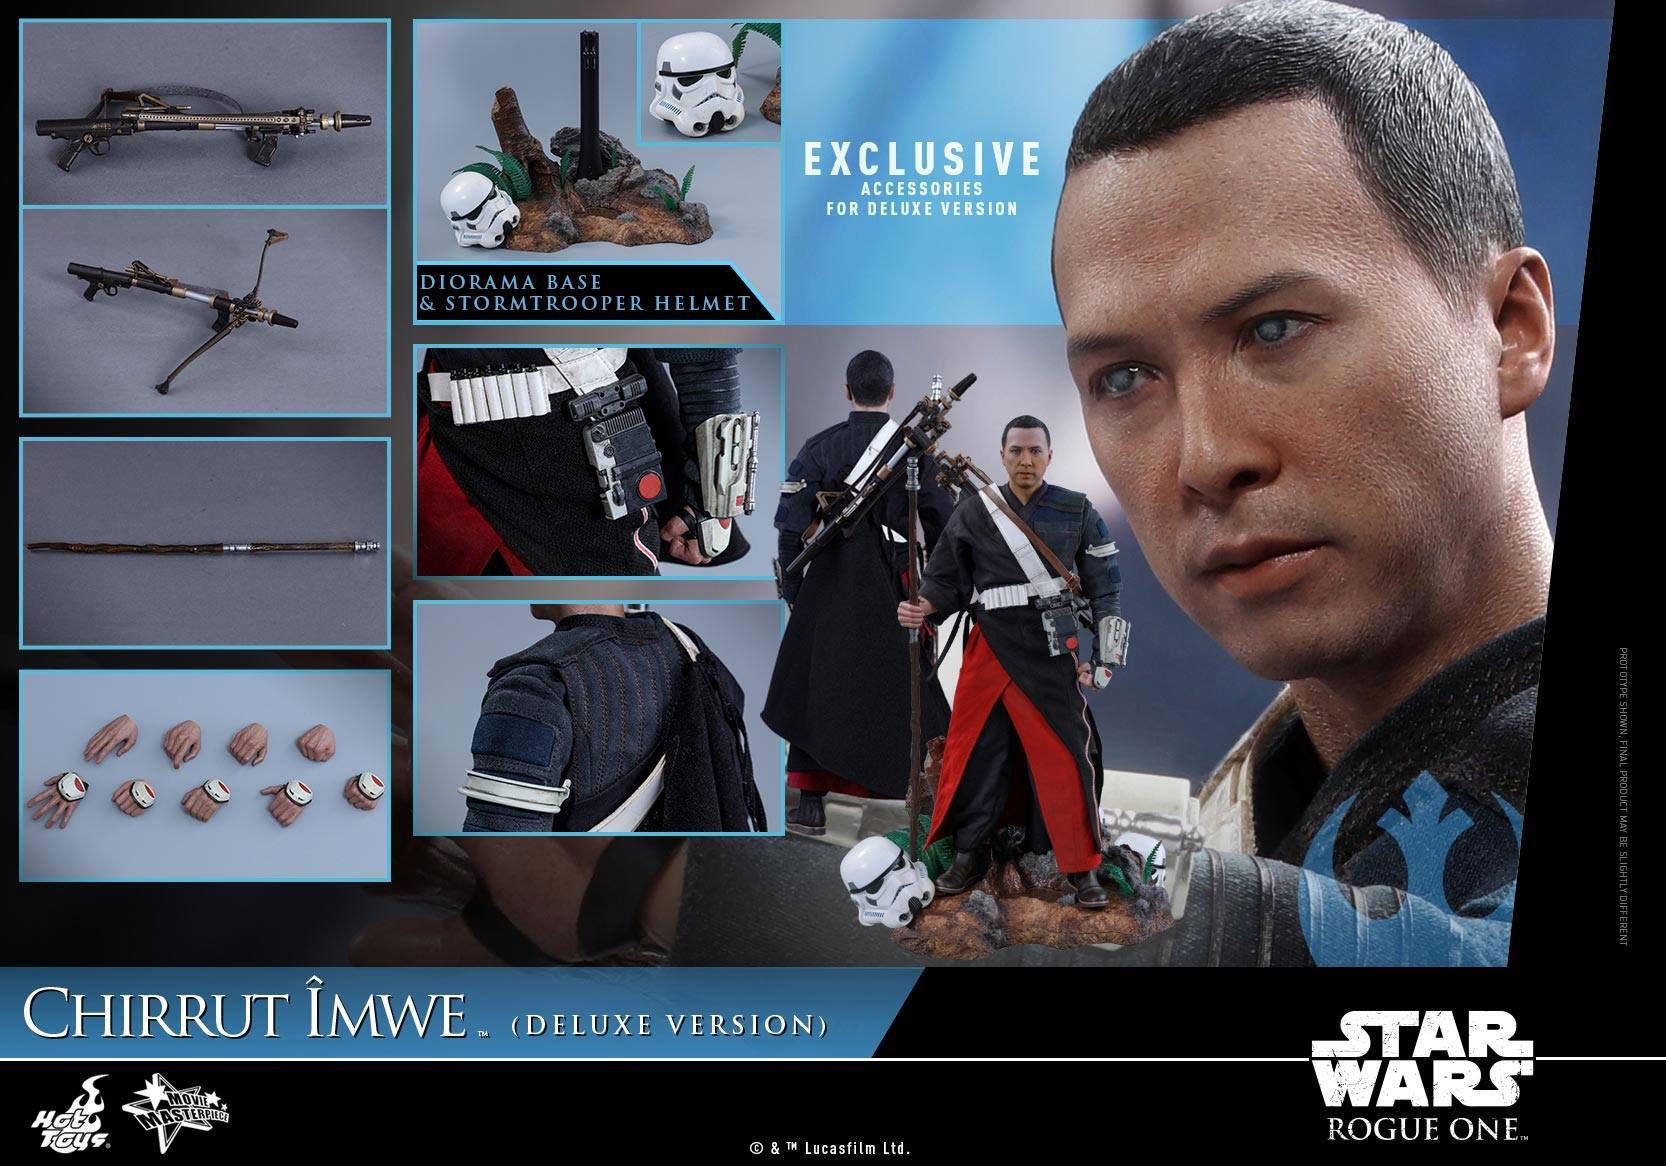 Hot-Toys-Star-Wars-Rogue-One-Chirrut-Imwe-figure-7